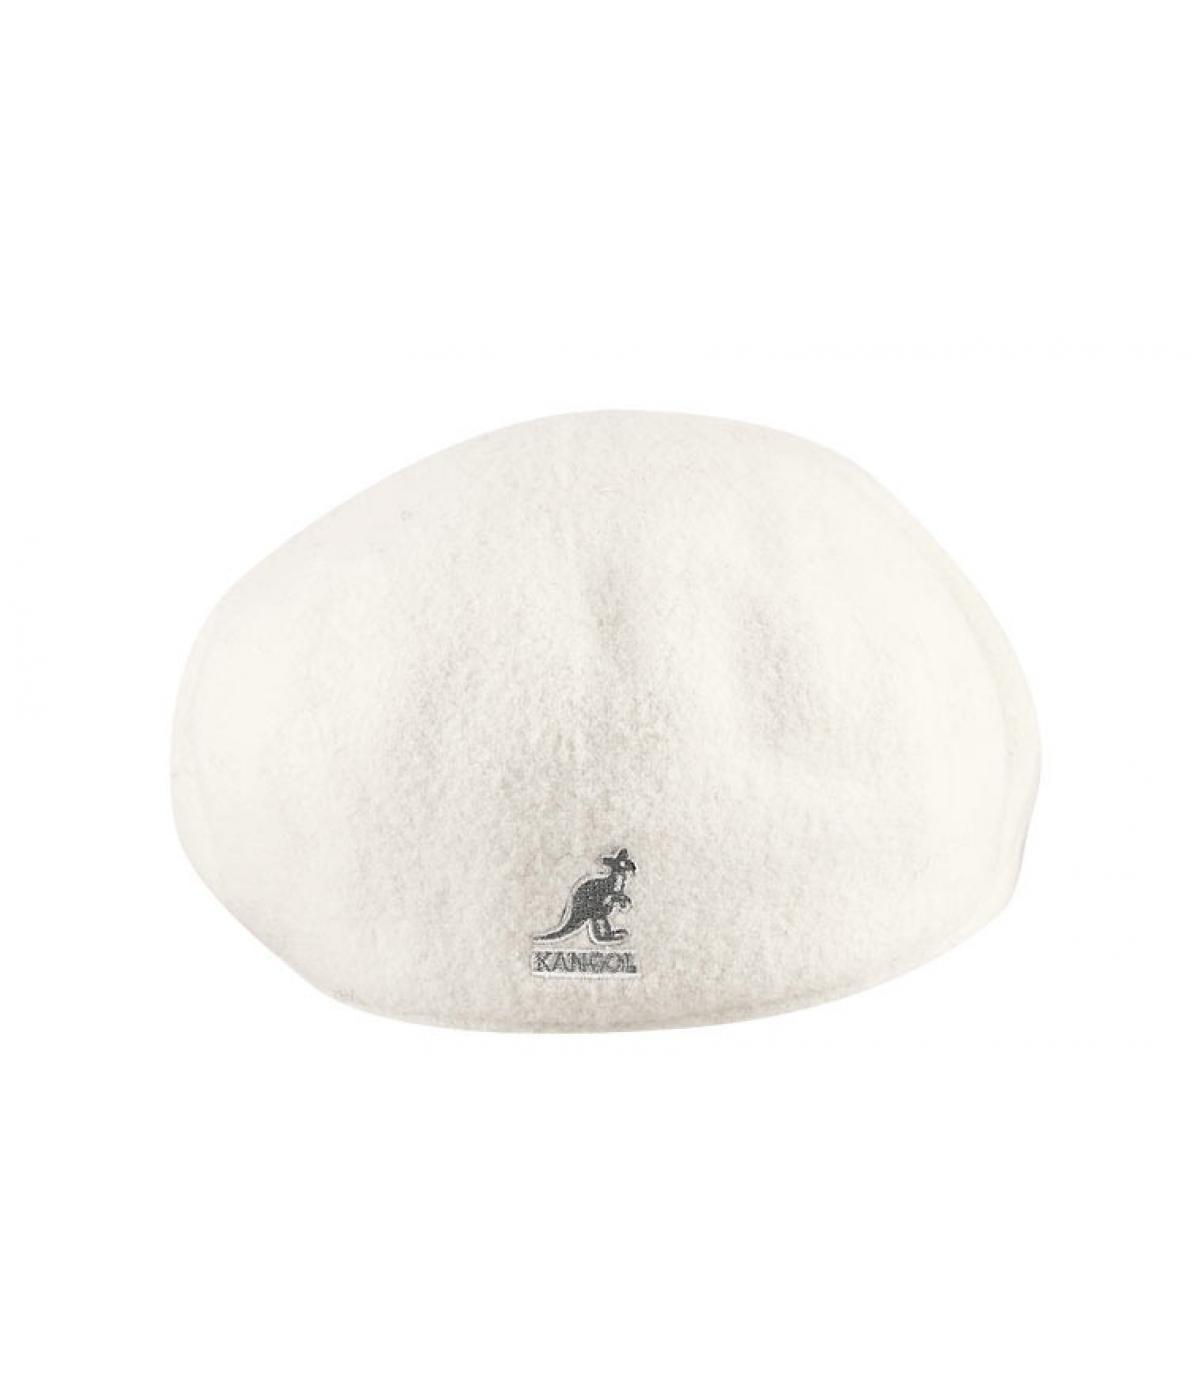 Détails 504 wool white - image 4